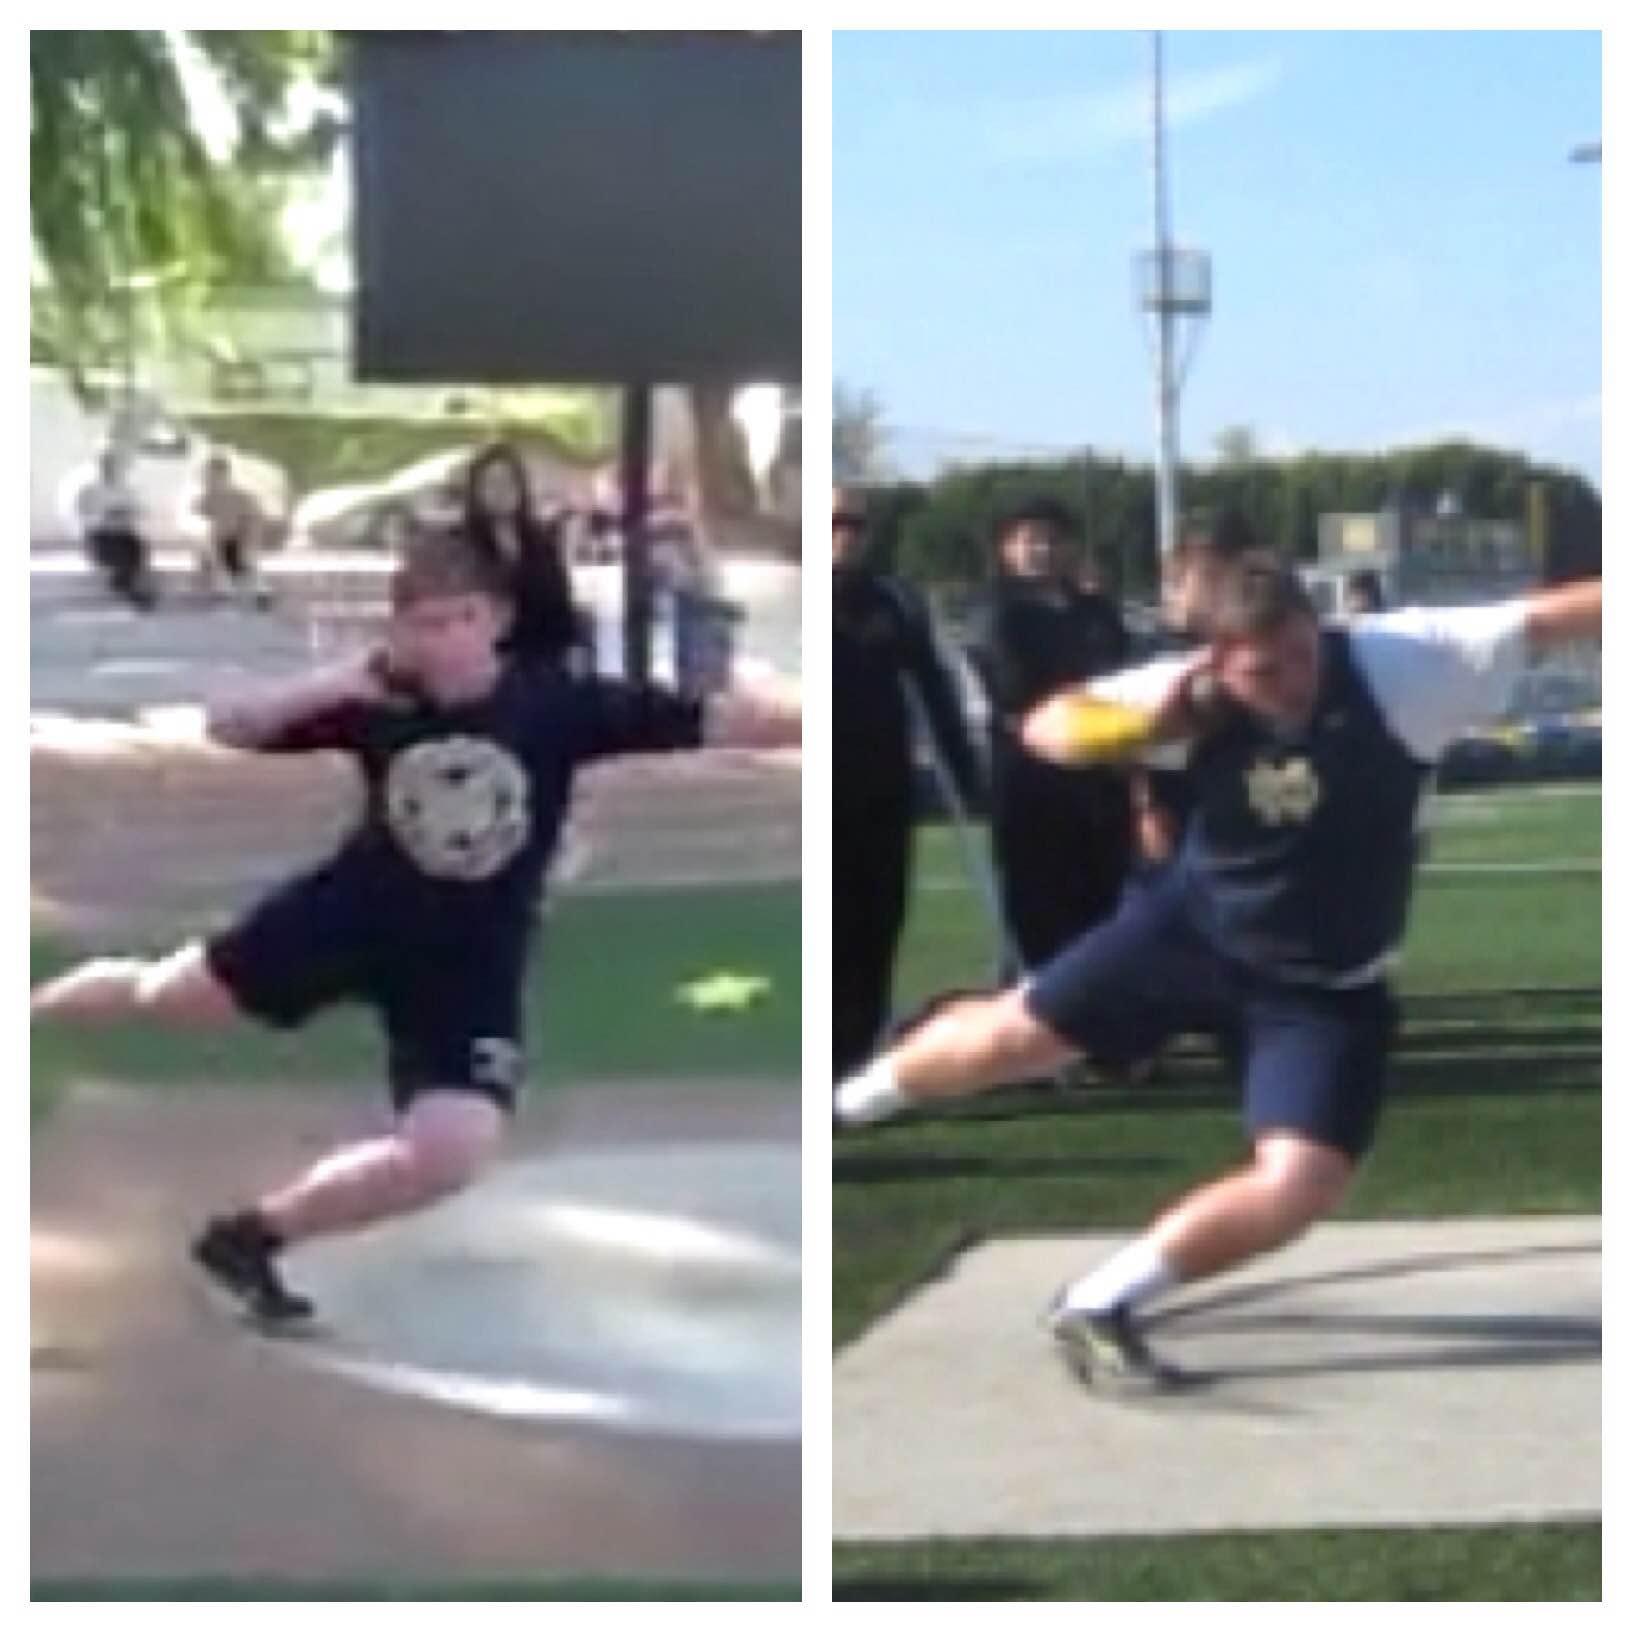 2013 vs. 2014